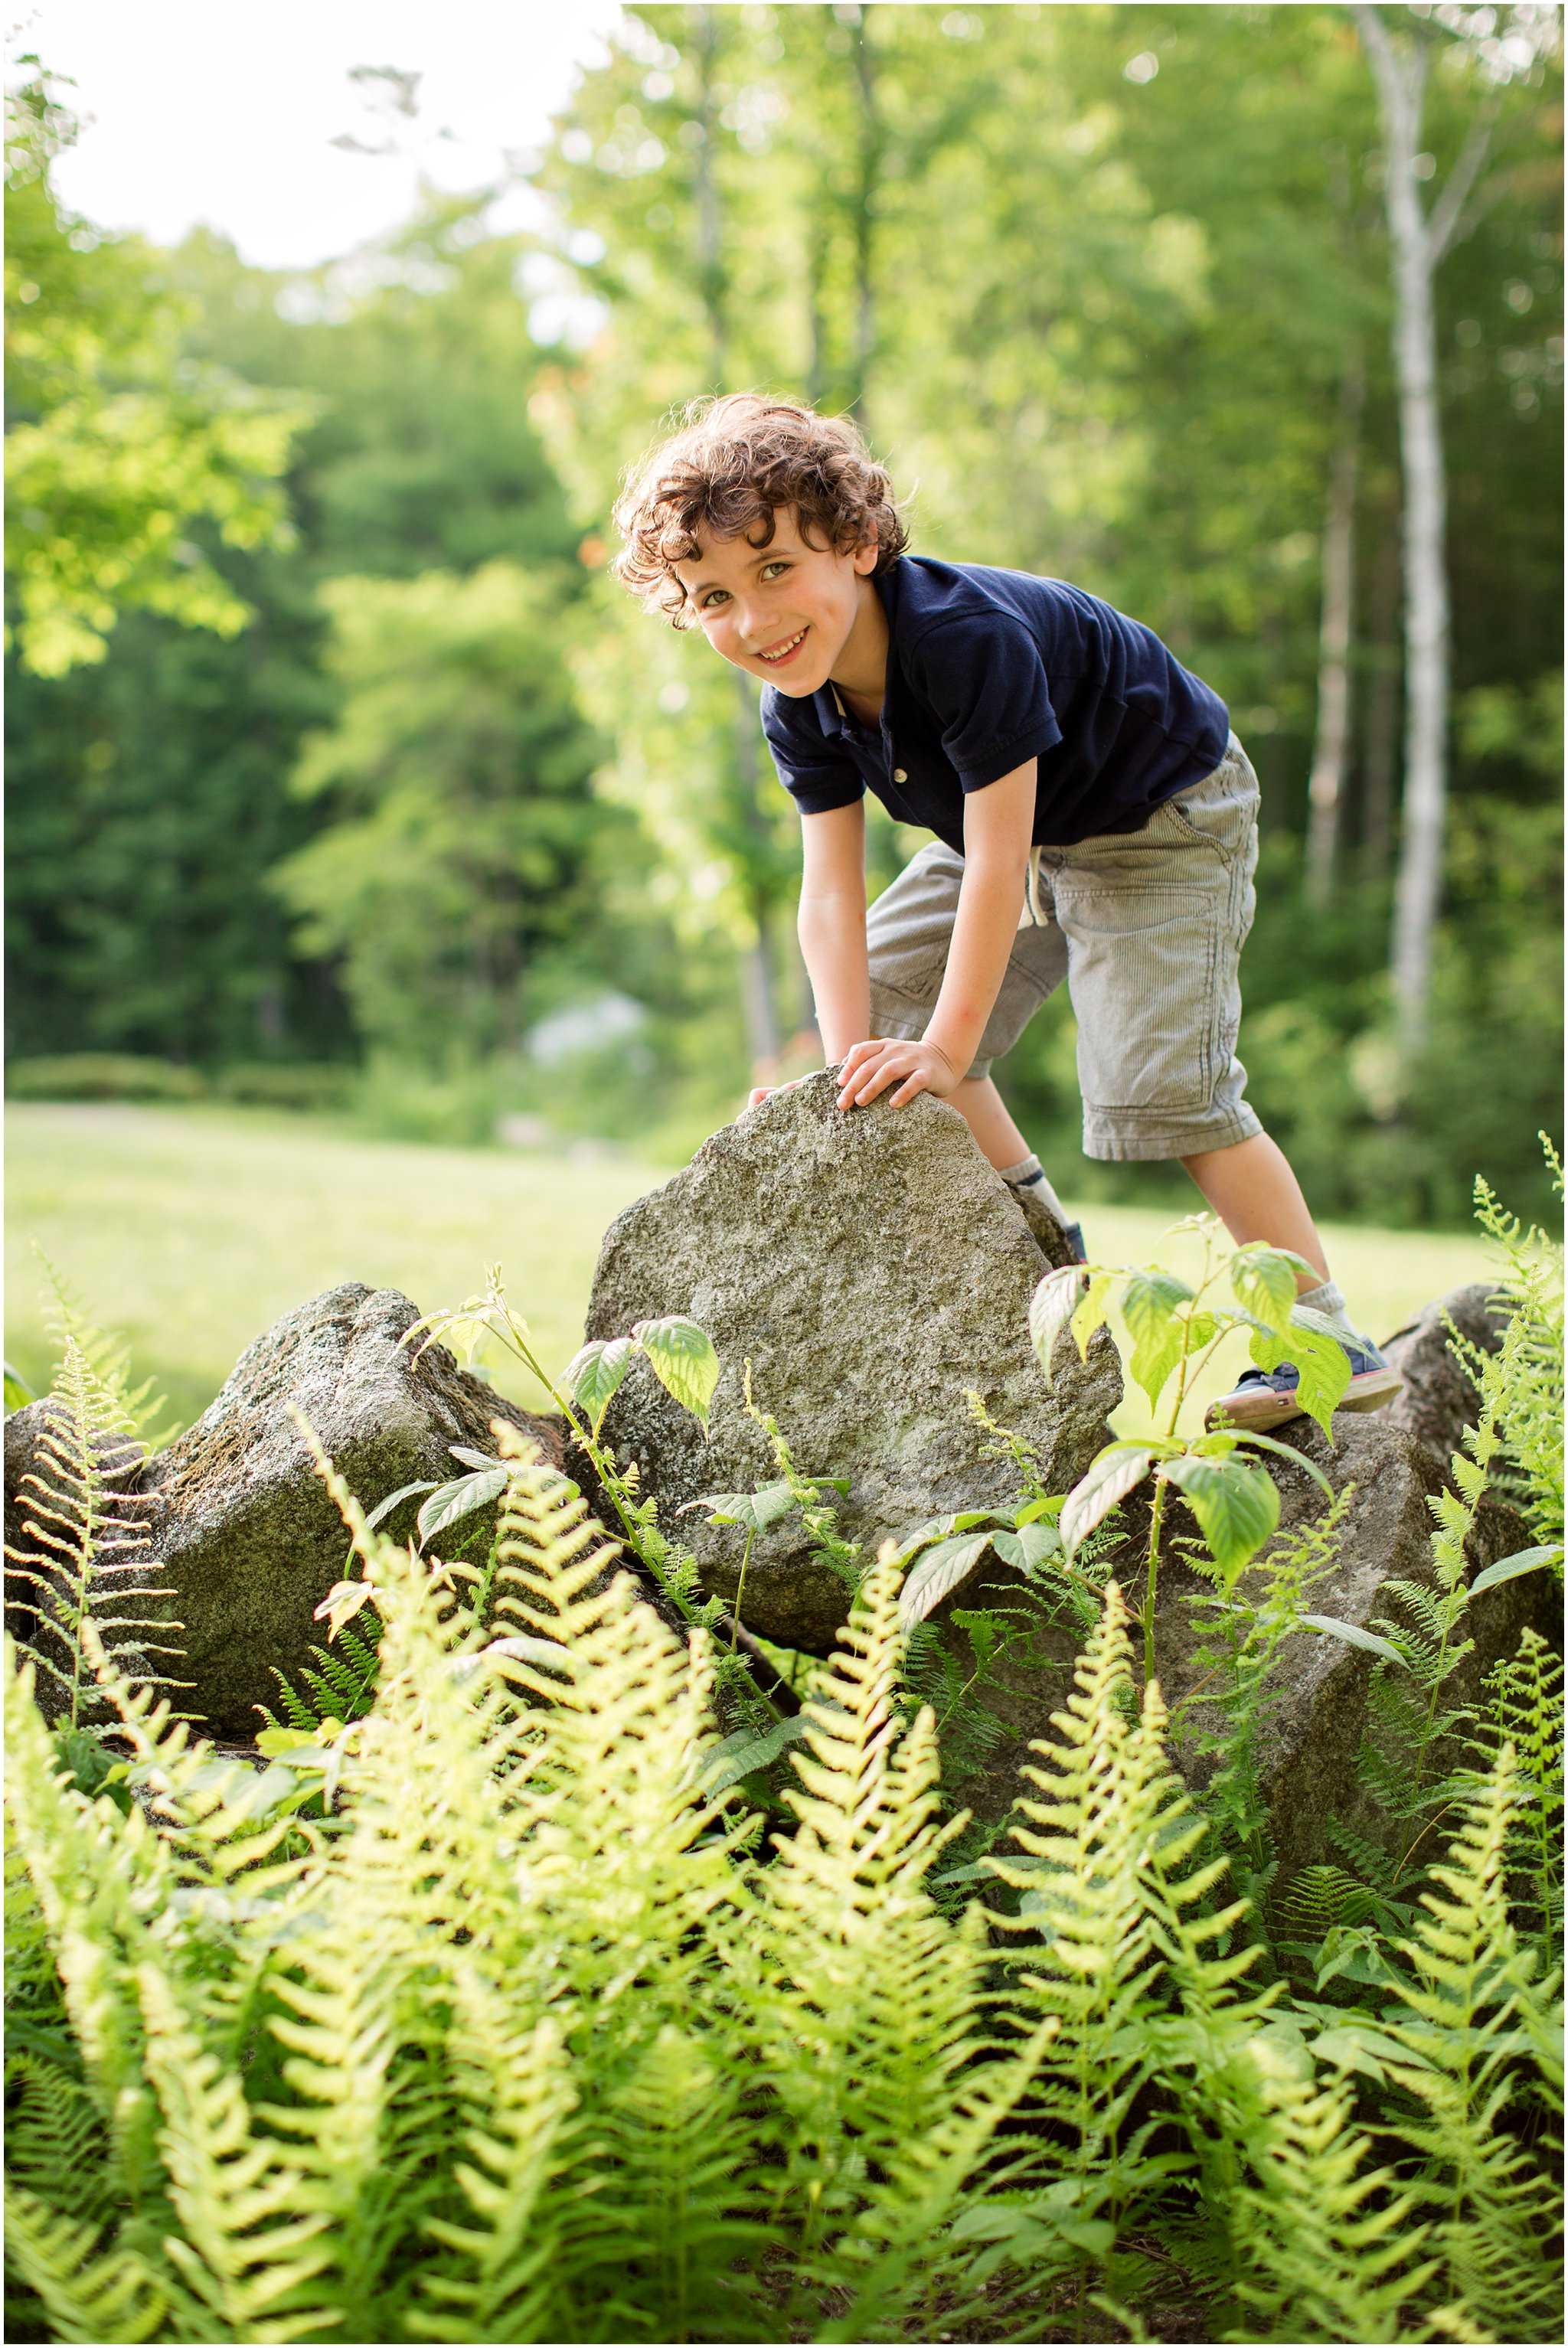 Boy climbing stone wall